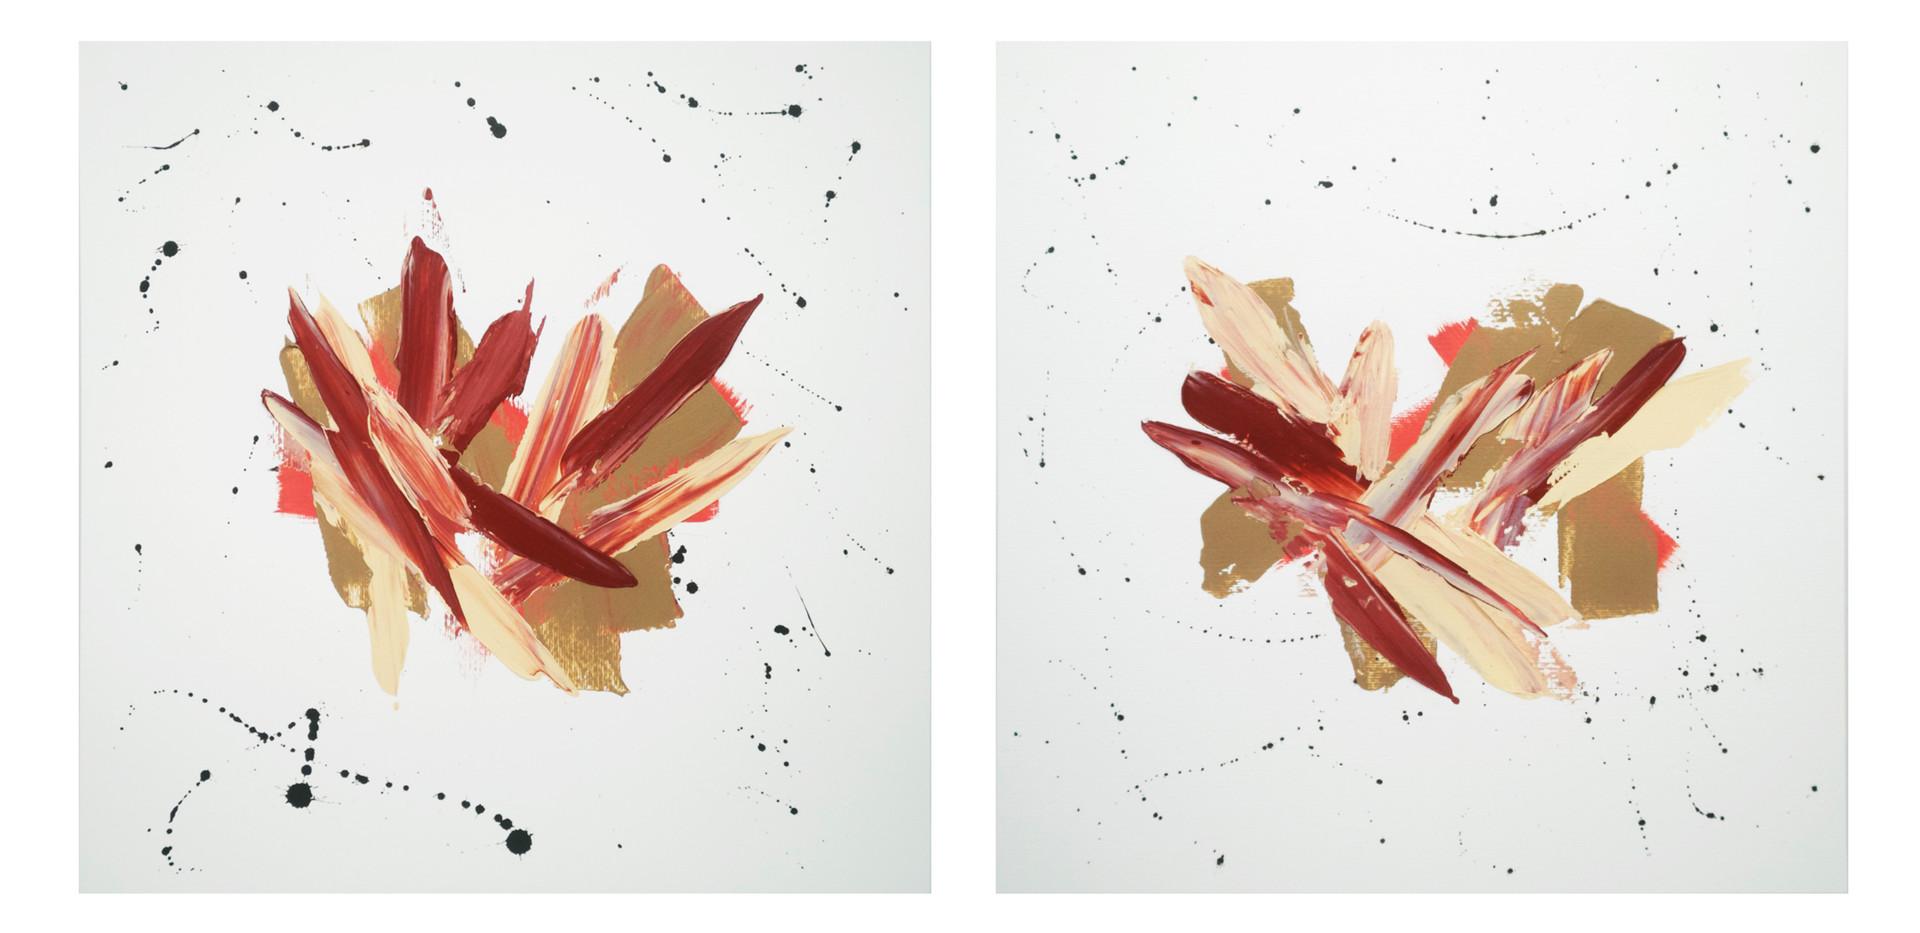 Karina Matheus - Hands on the soil I & II